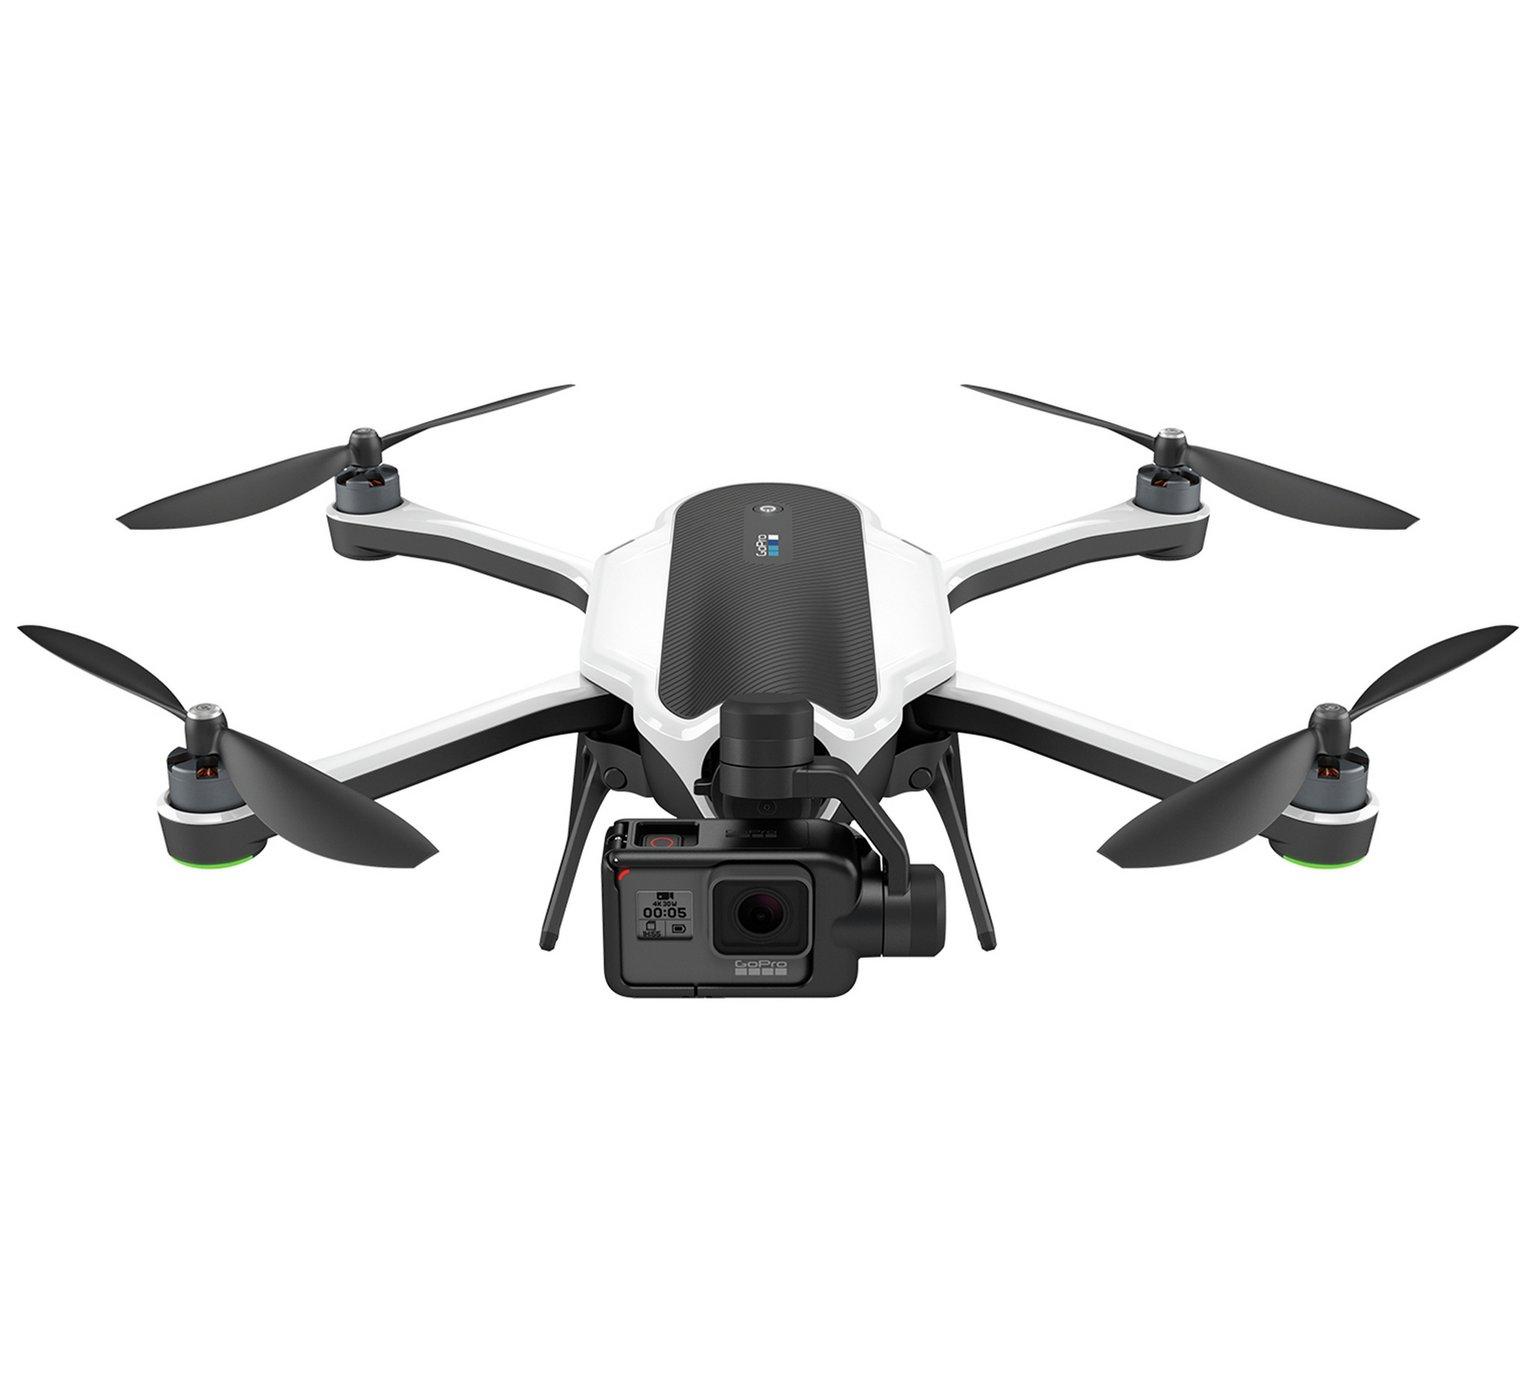 GoPro Karma Drone with Hero 5 Black Camera